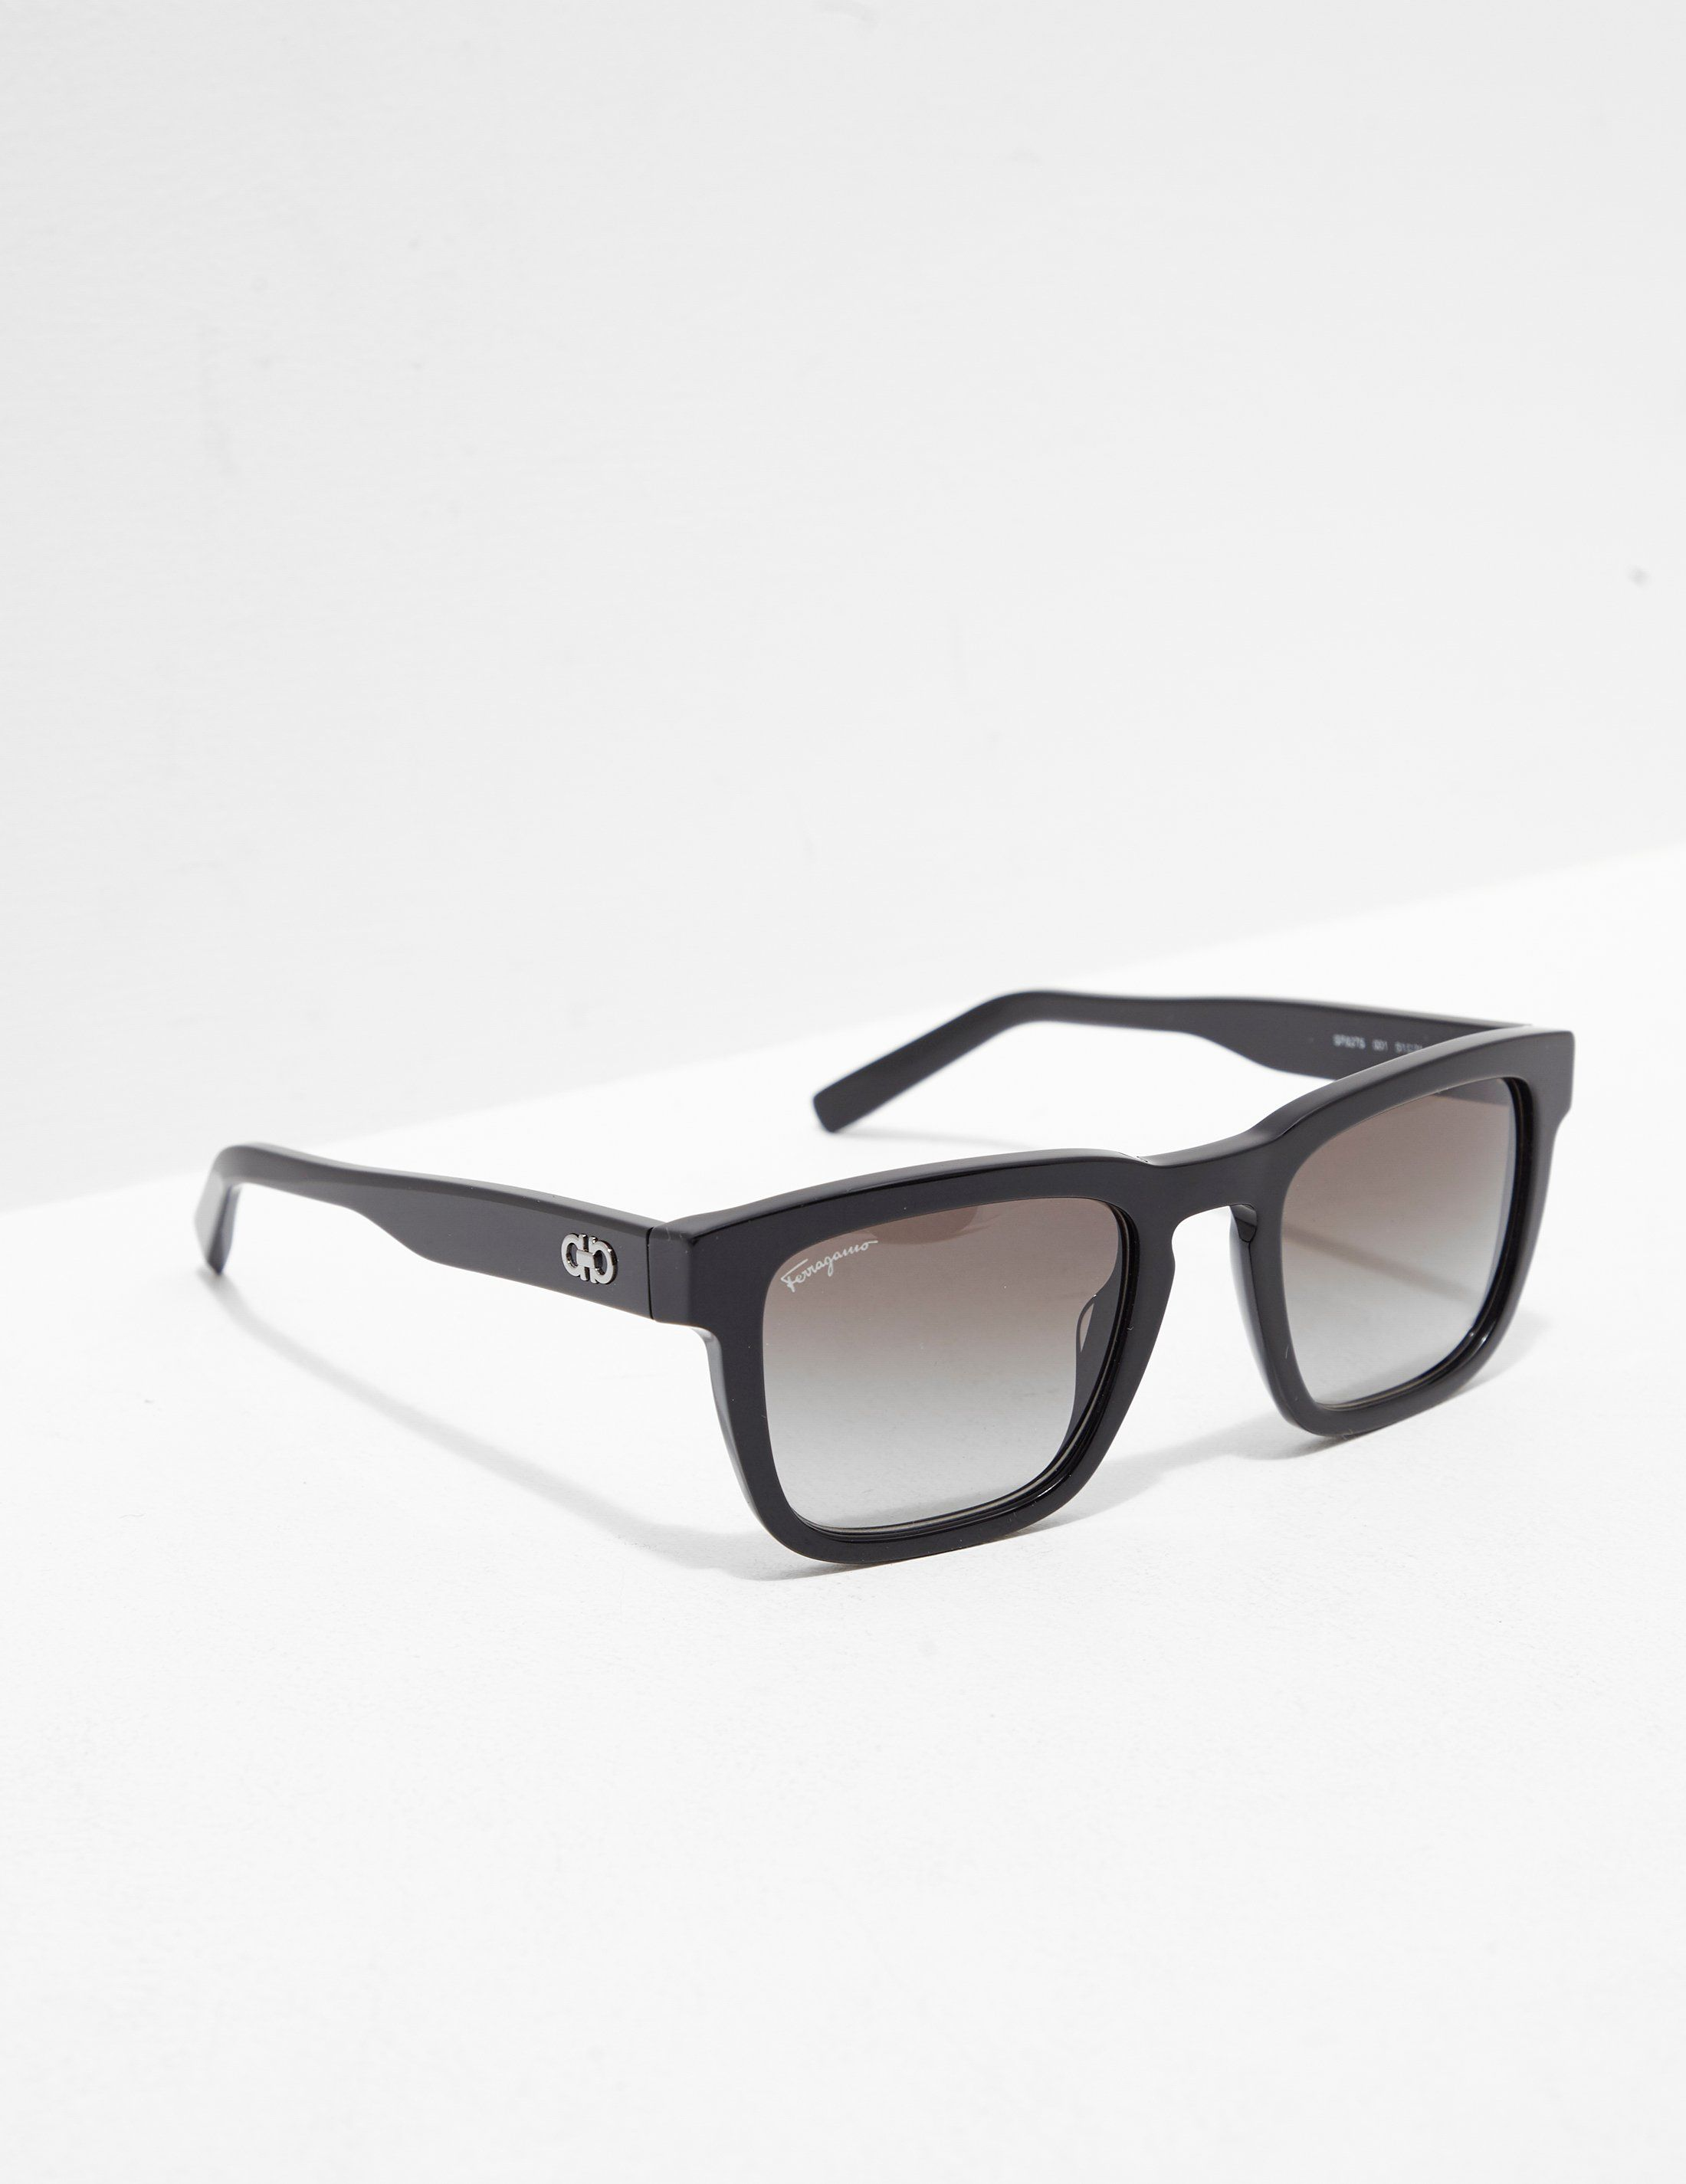 Salvatore Ferragamo Squared Sunglasses